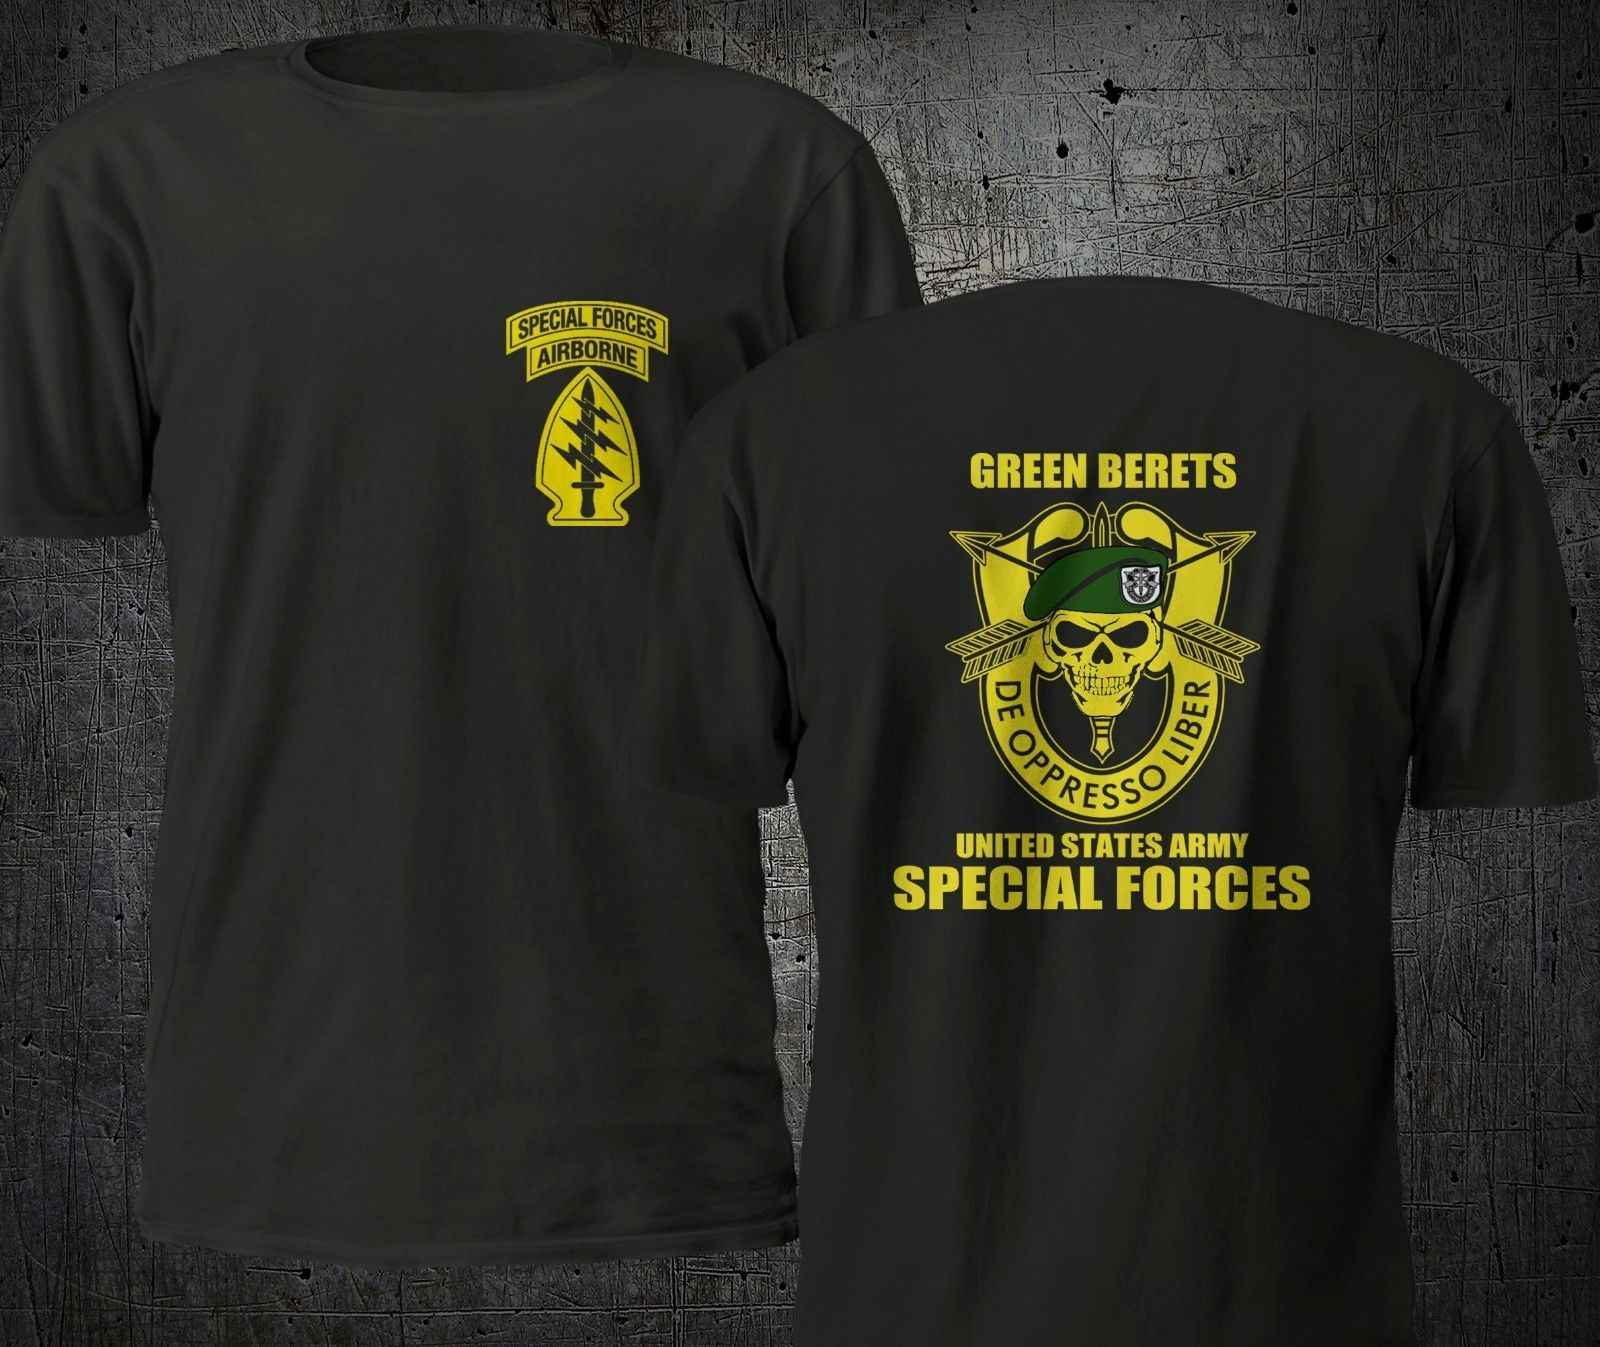 Группа спецназа AIRBORNE Военная футболка S-4XL